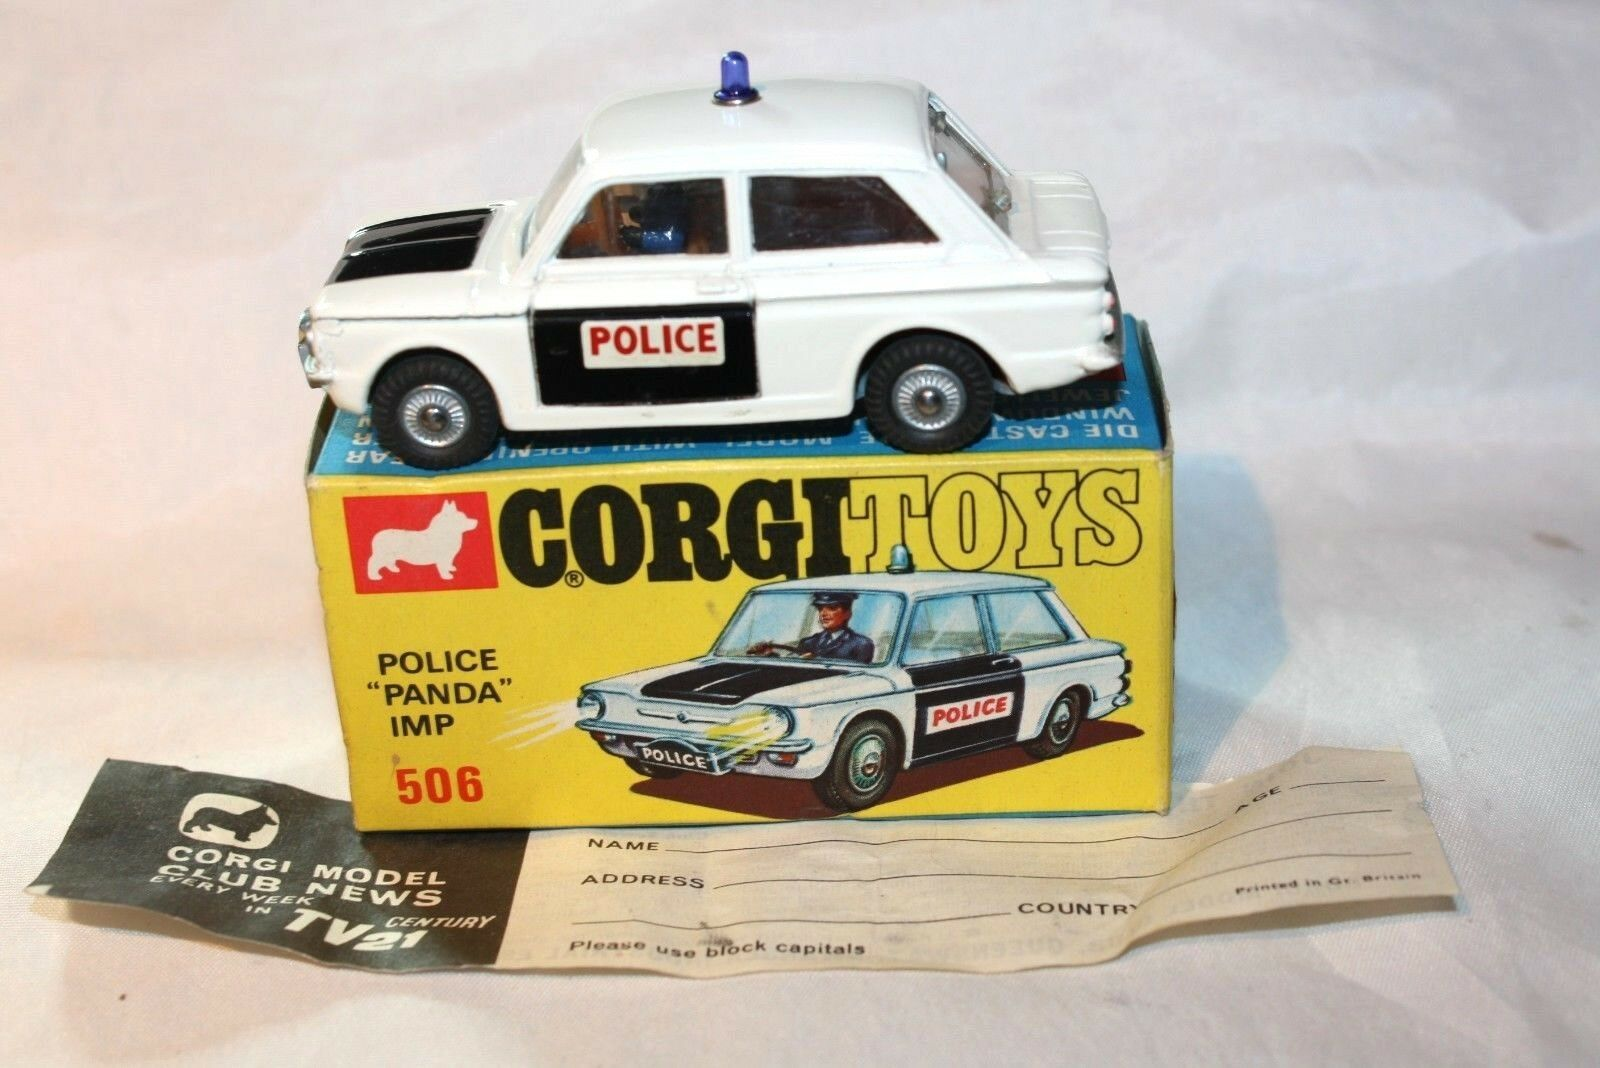 Corgi Imp Police Panda Car, Excellent in Good Original Box